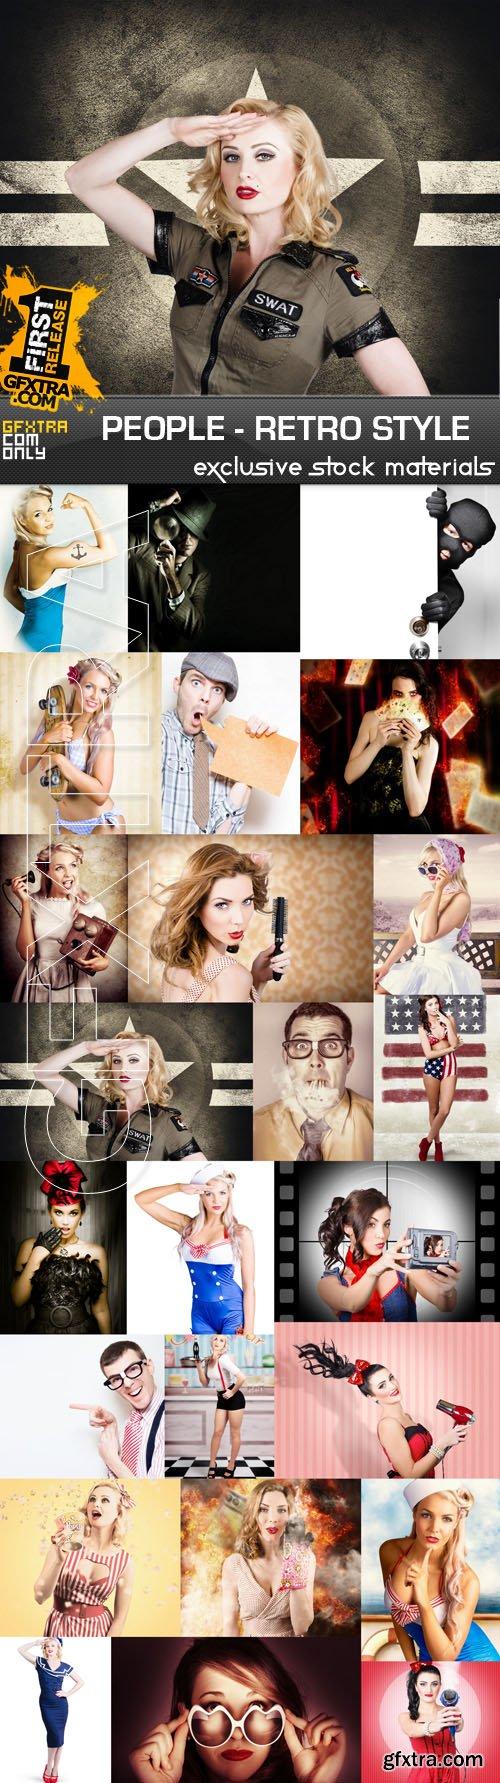 People - Retro Style, 25xUHQ JPEG